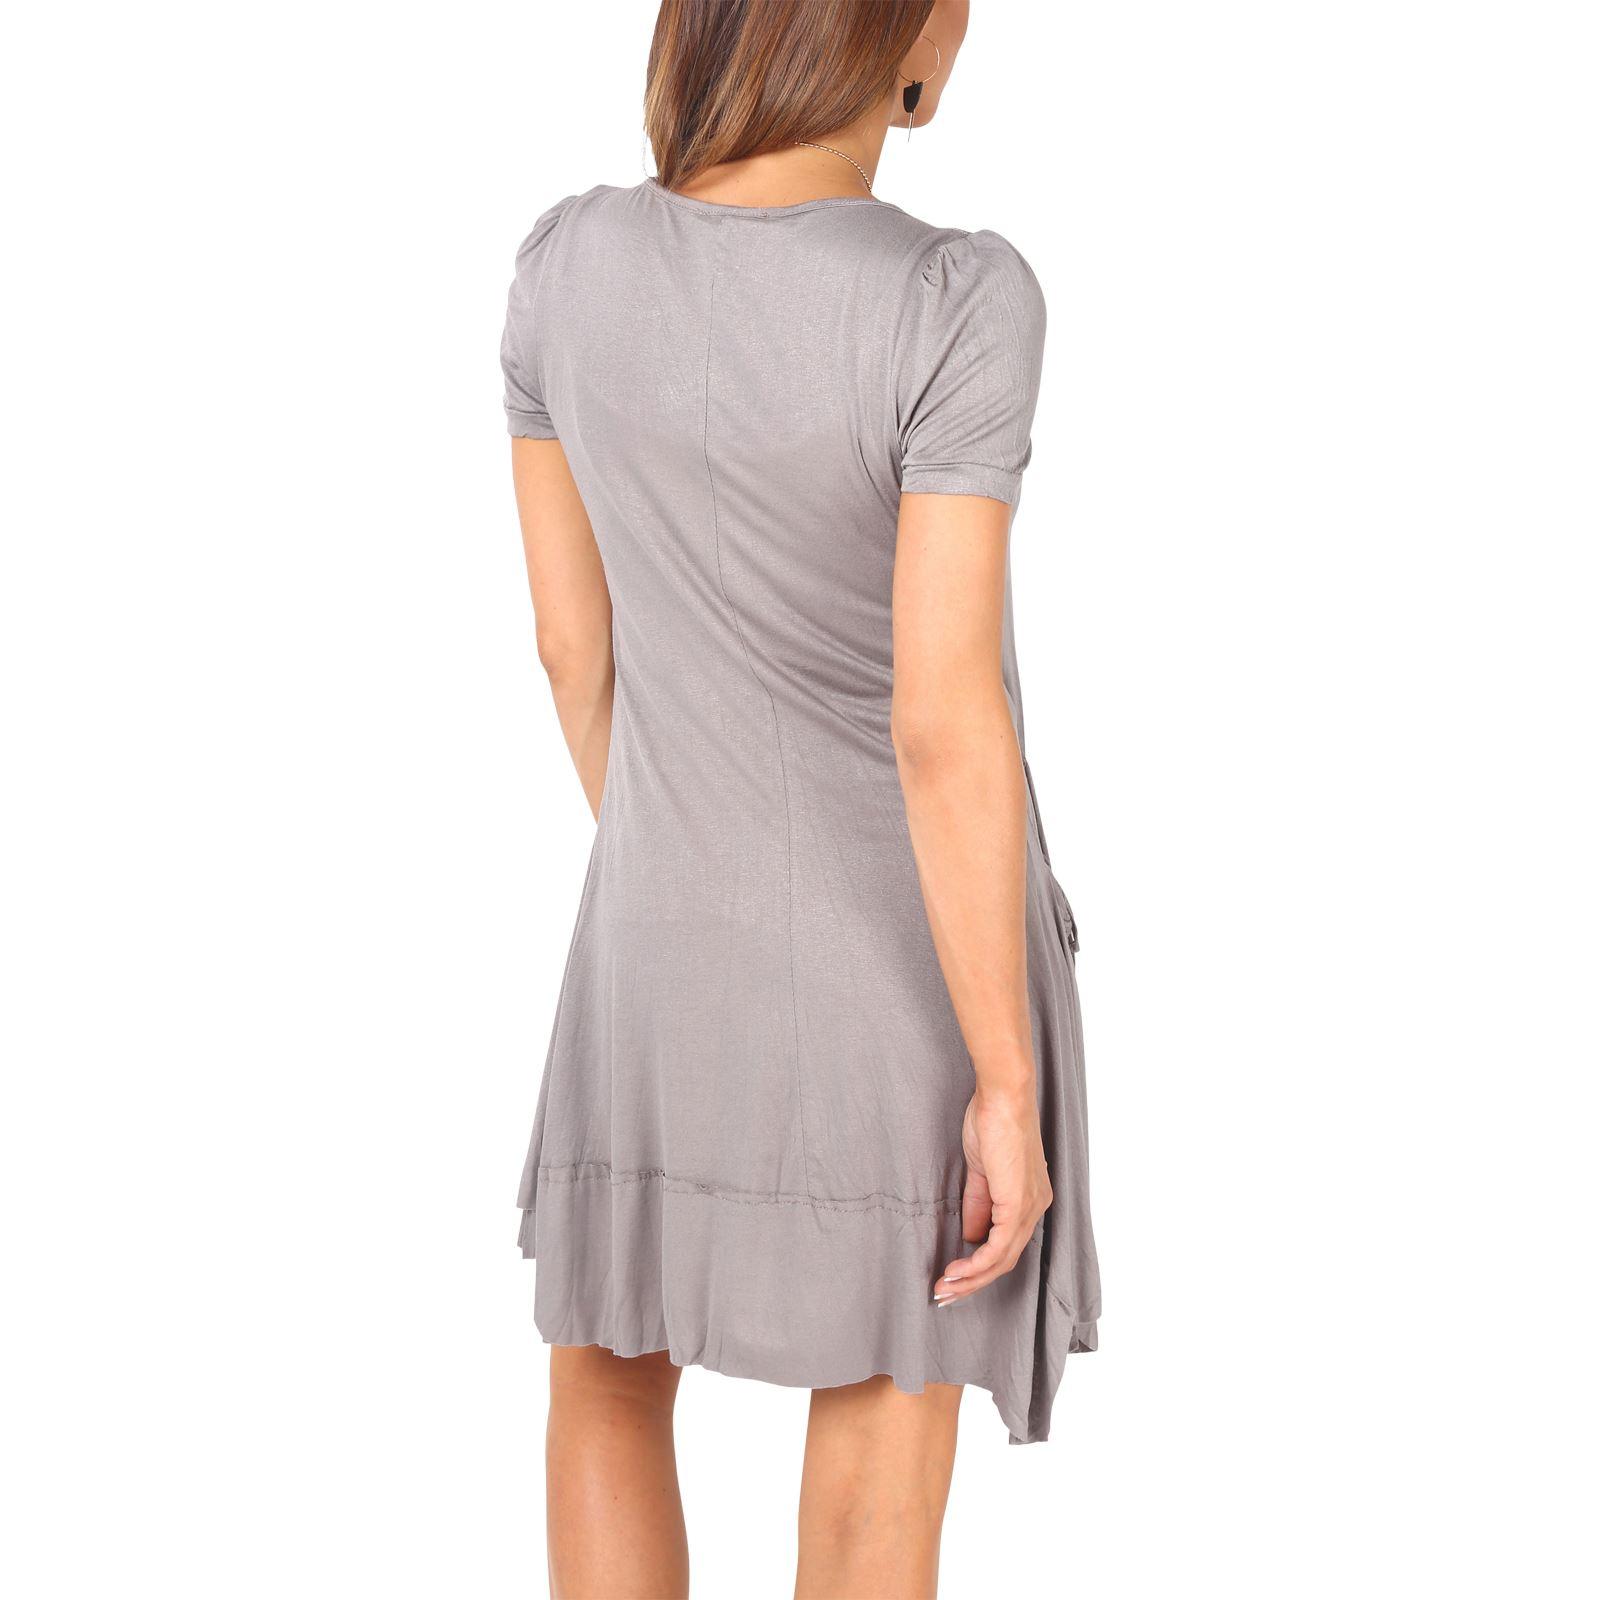 KRISP-Women-2-in-1-Boho-Gypsy-Tunic-Dress-Top-Tee-Jersey-Pleated-A-Line-Necklace thumbnail 16